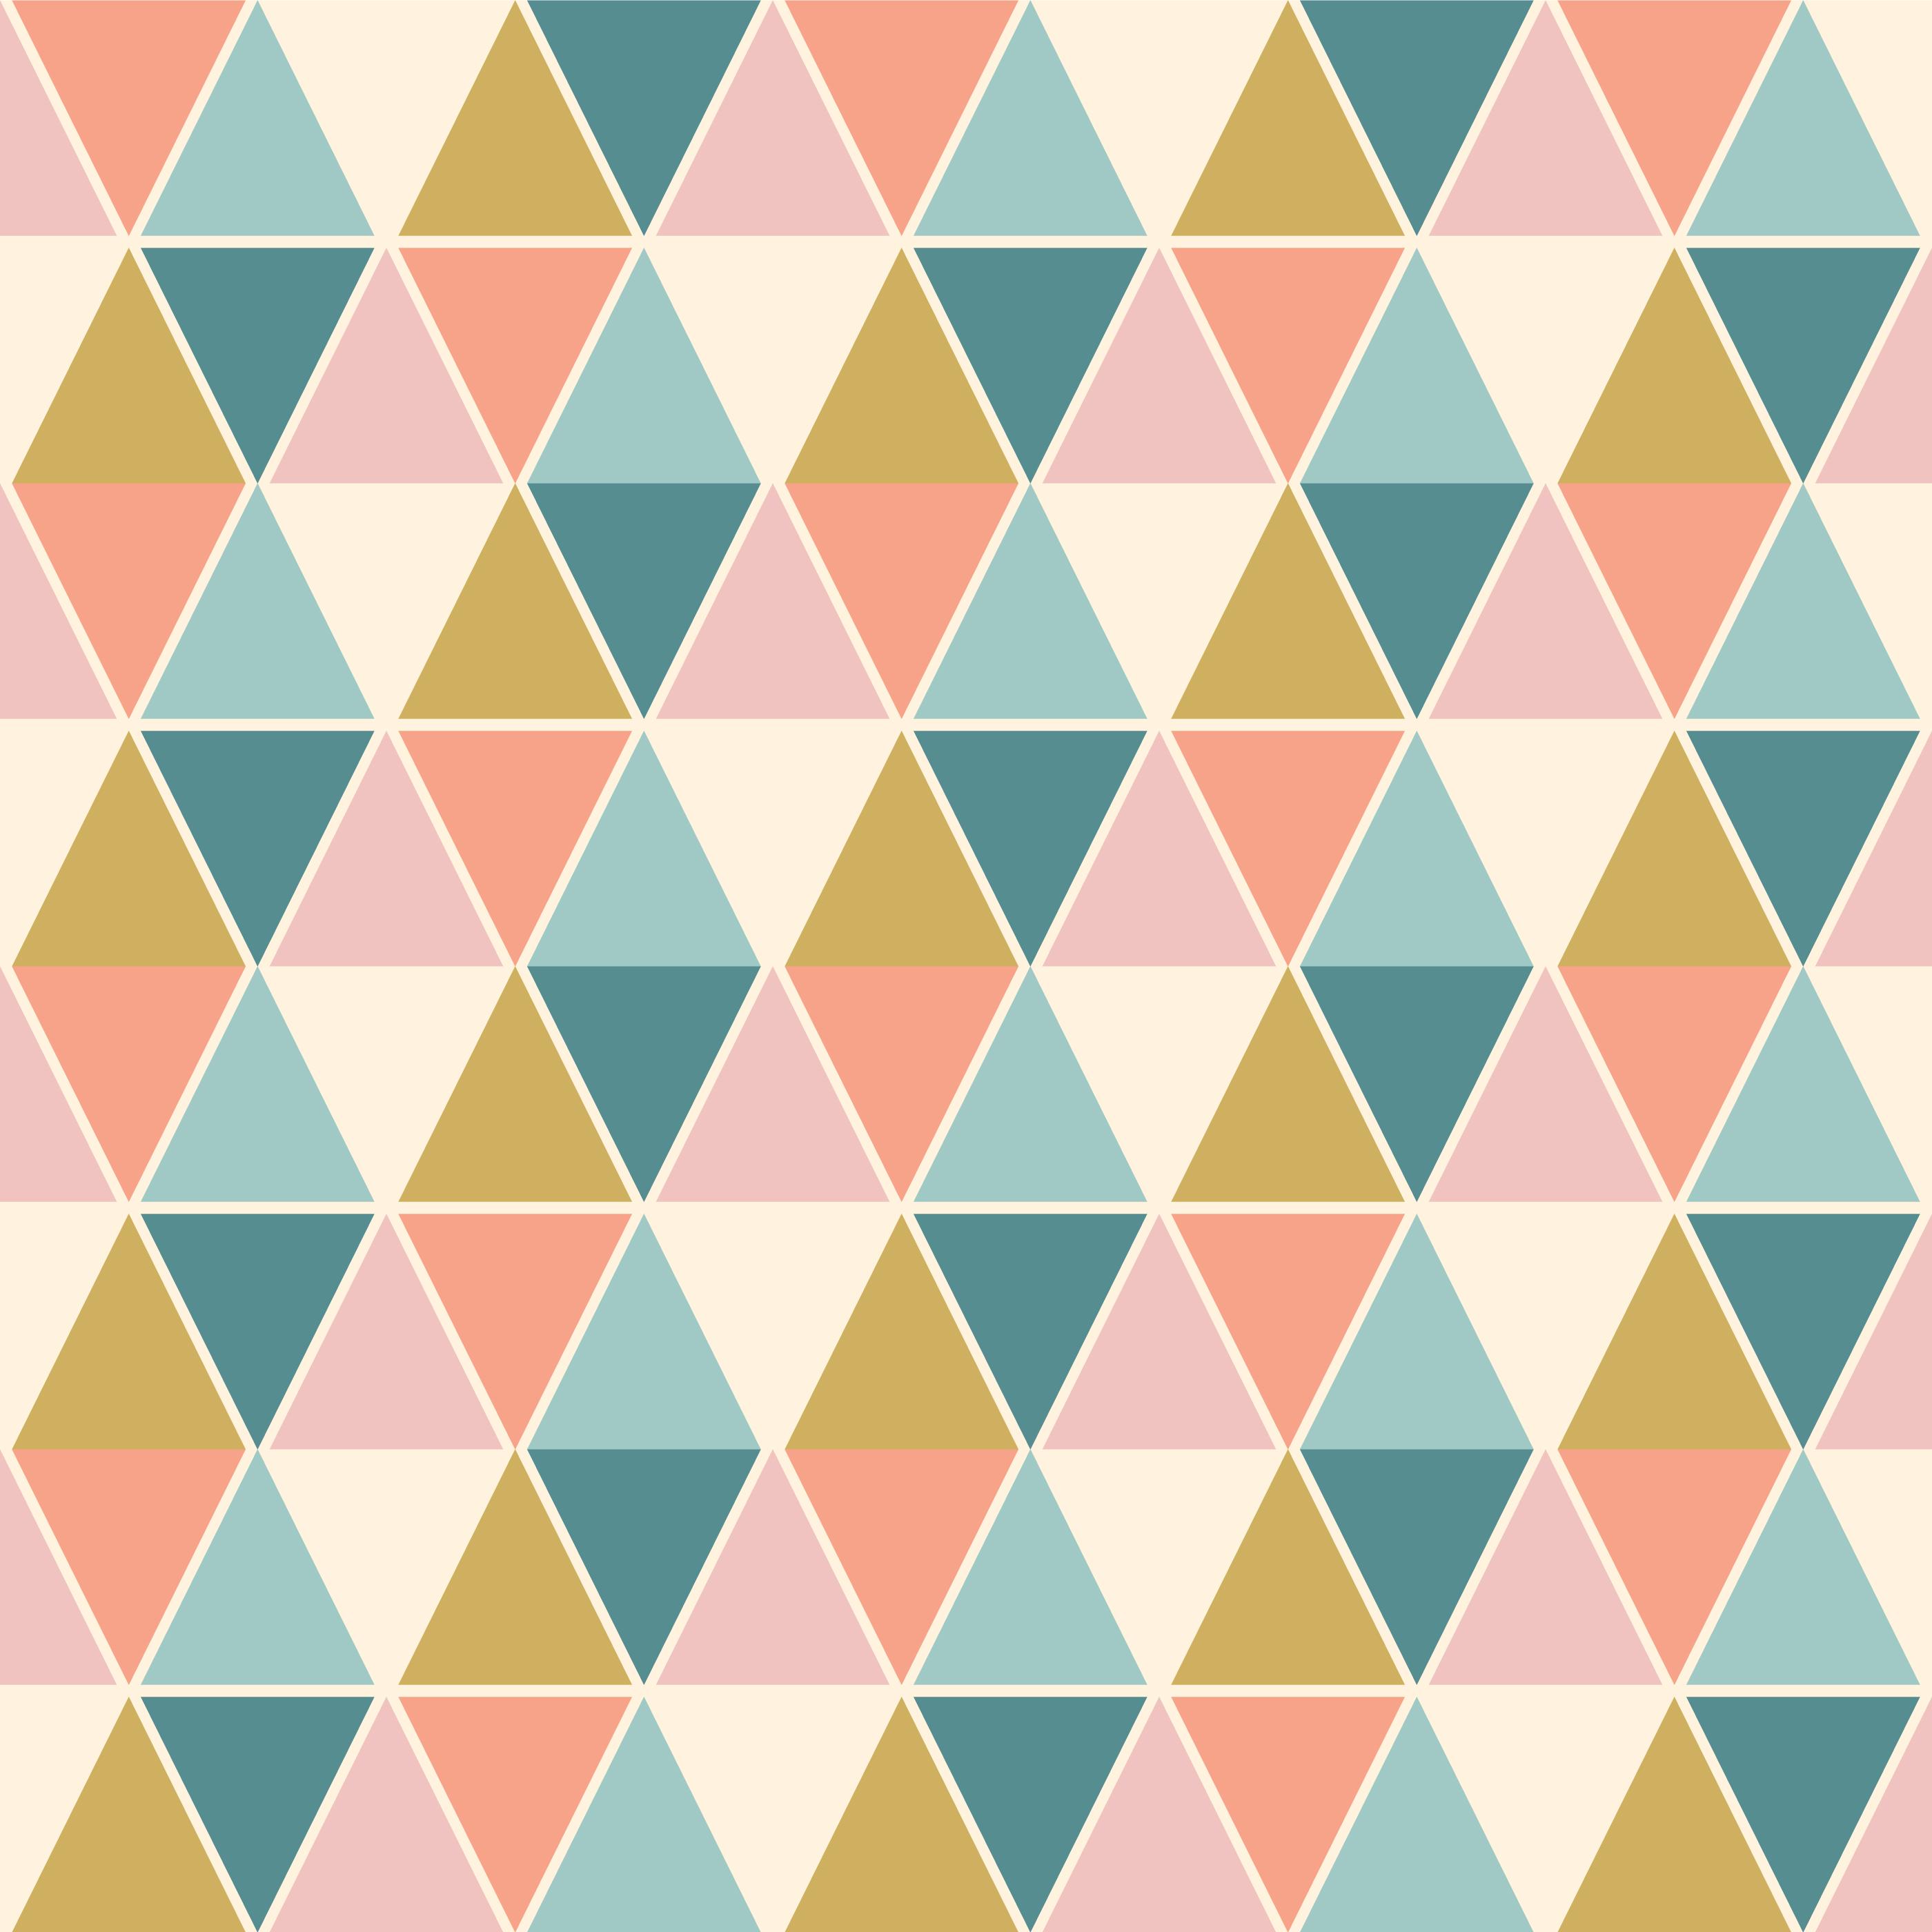 Colorful Argyle Harlequin Seamless Pattern